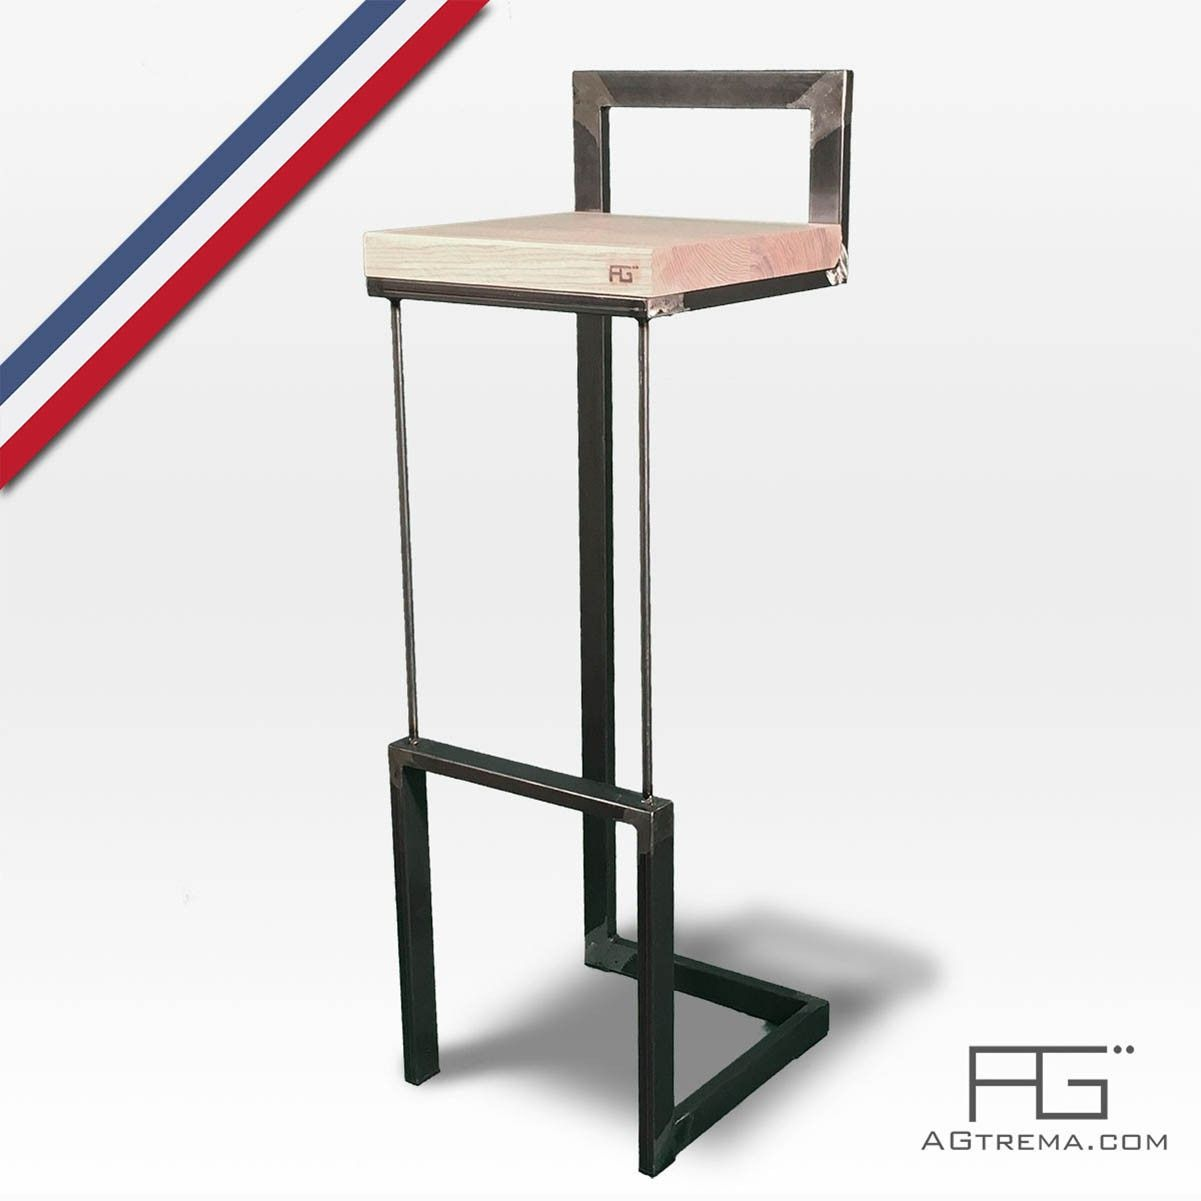 tabouret de bar buccula en acier brut et bois massif artisanat francais stools pinterest. Black Bedroom Furniture Sets. Home Design Ideas